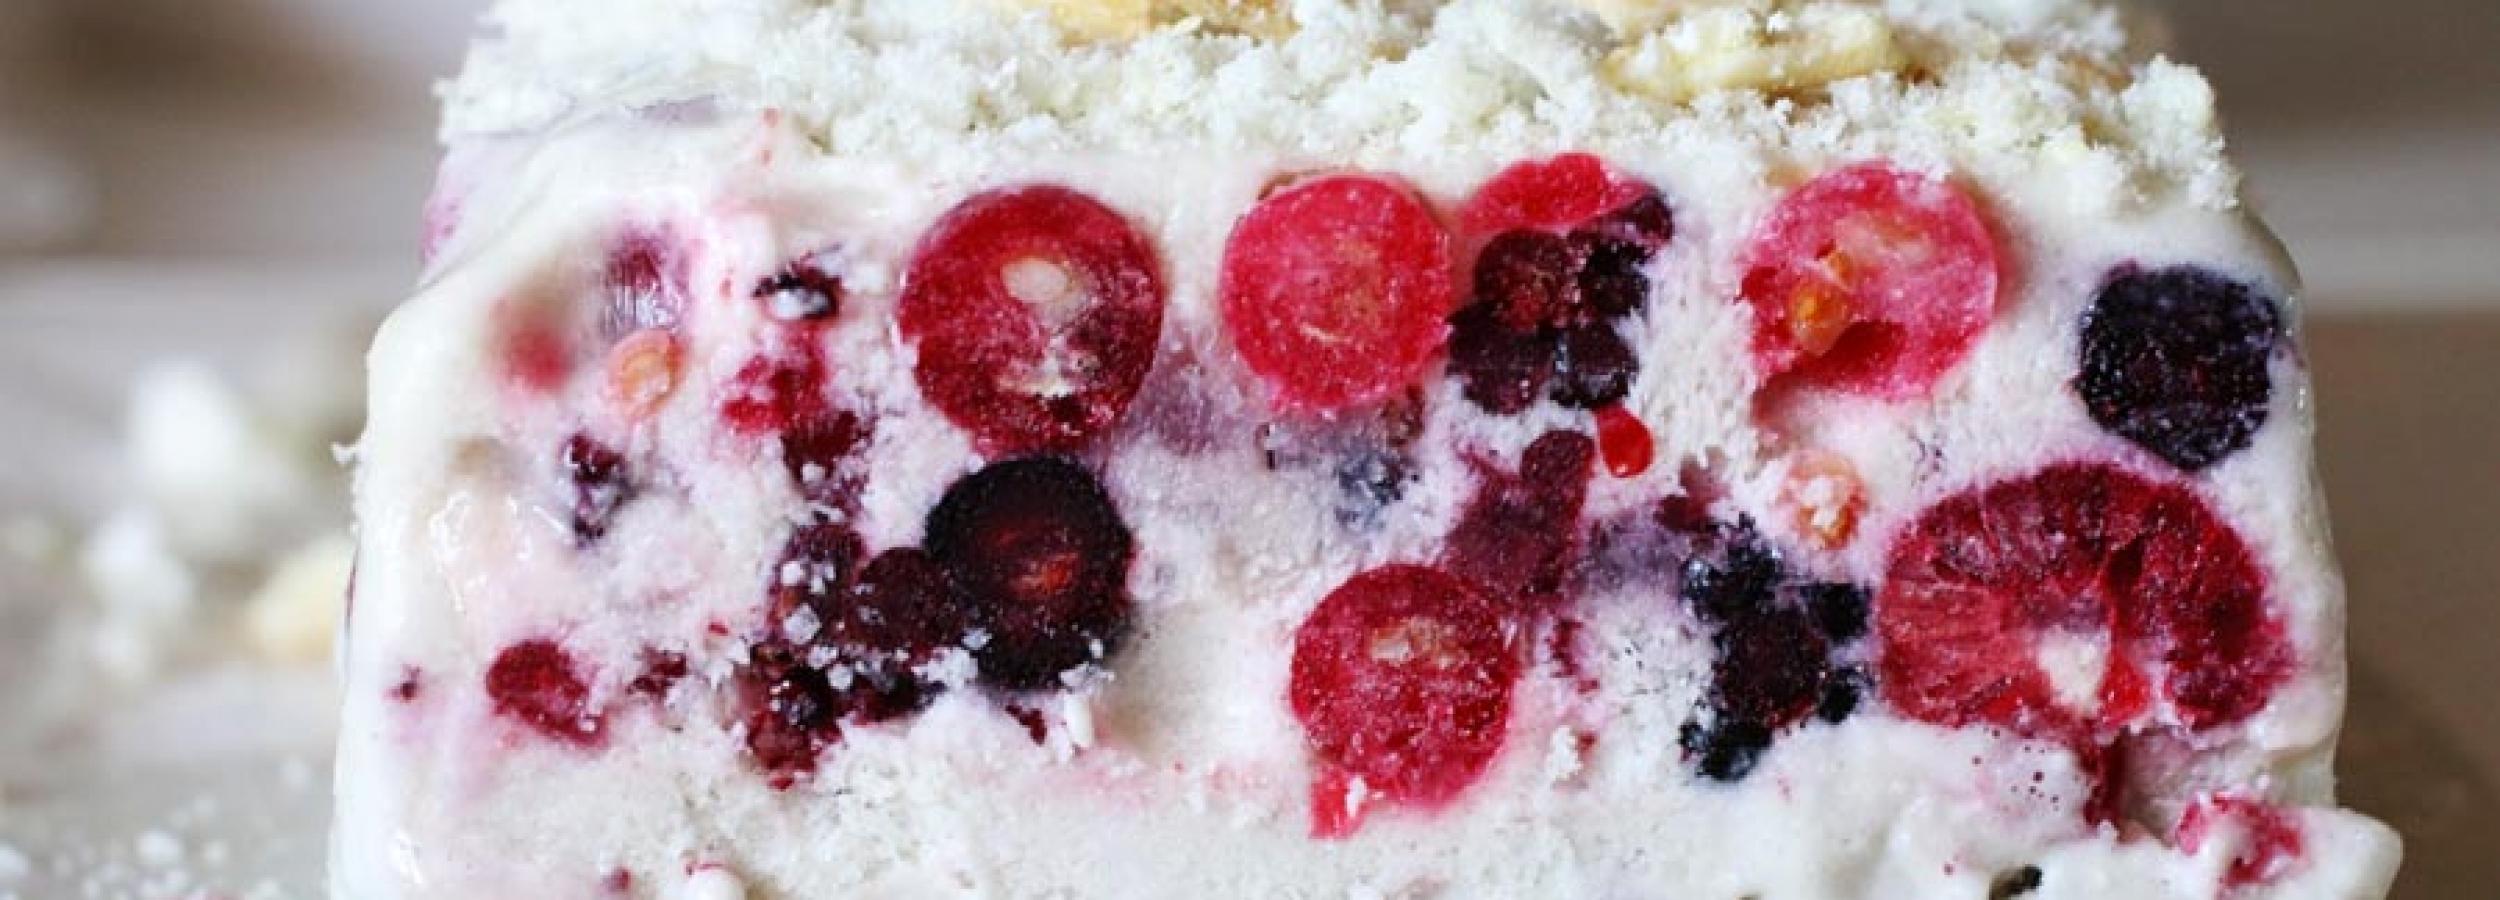 Semifreddo-ai-Frutti-di-Bosco-Senza-Panna-Senza-Zucchero